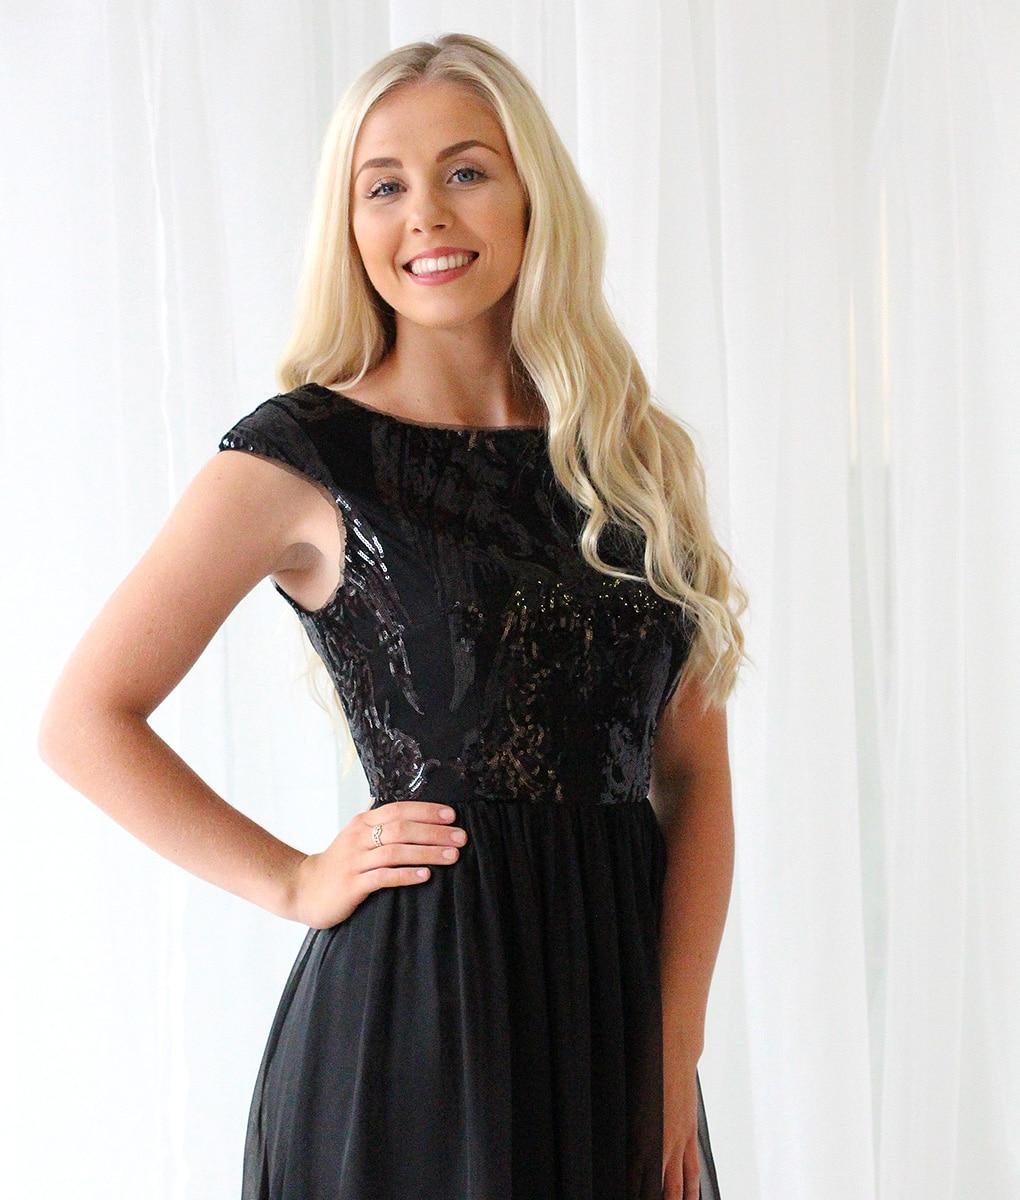 Alila-Black-Sequin-Chiffon-Bridesmaid-Dress-Bariano-gown